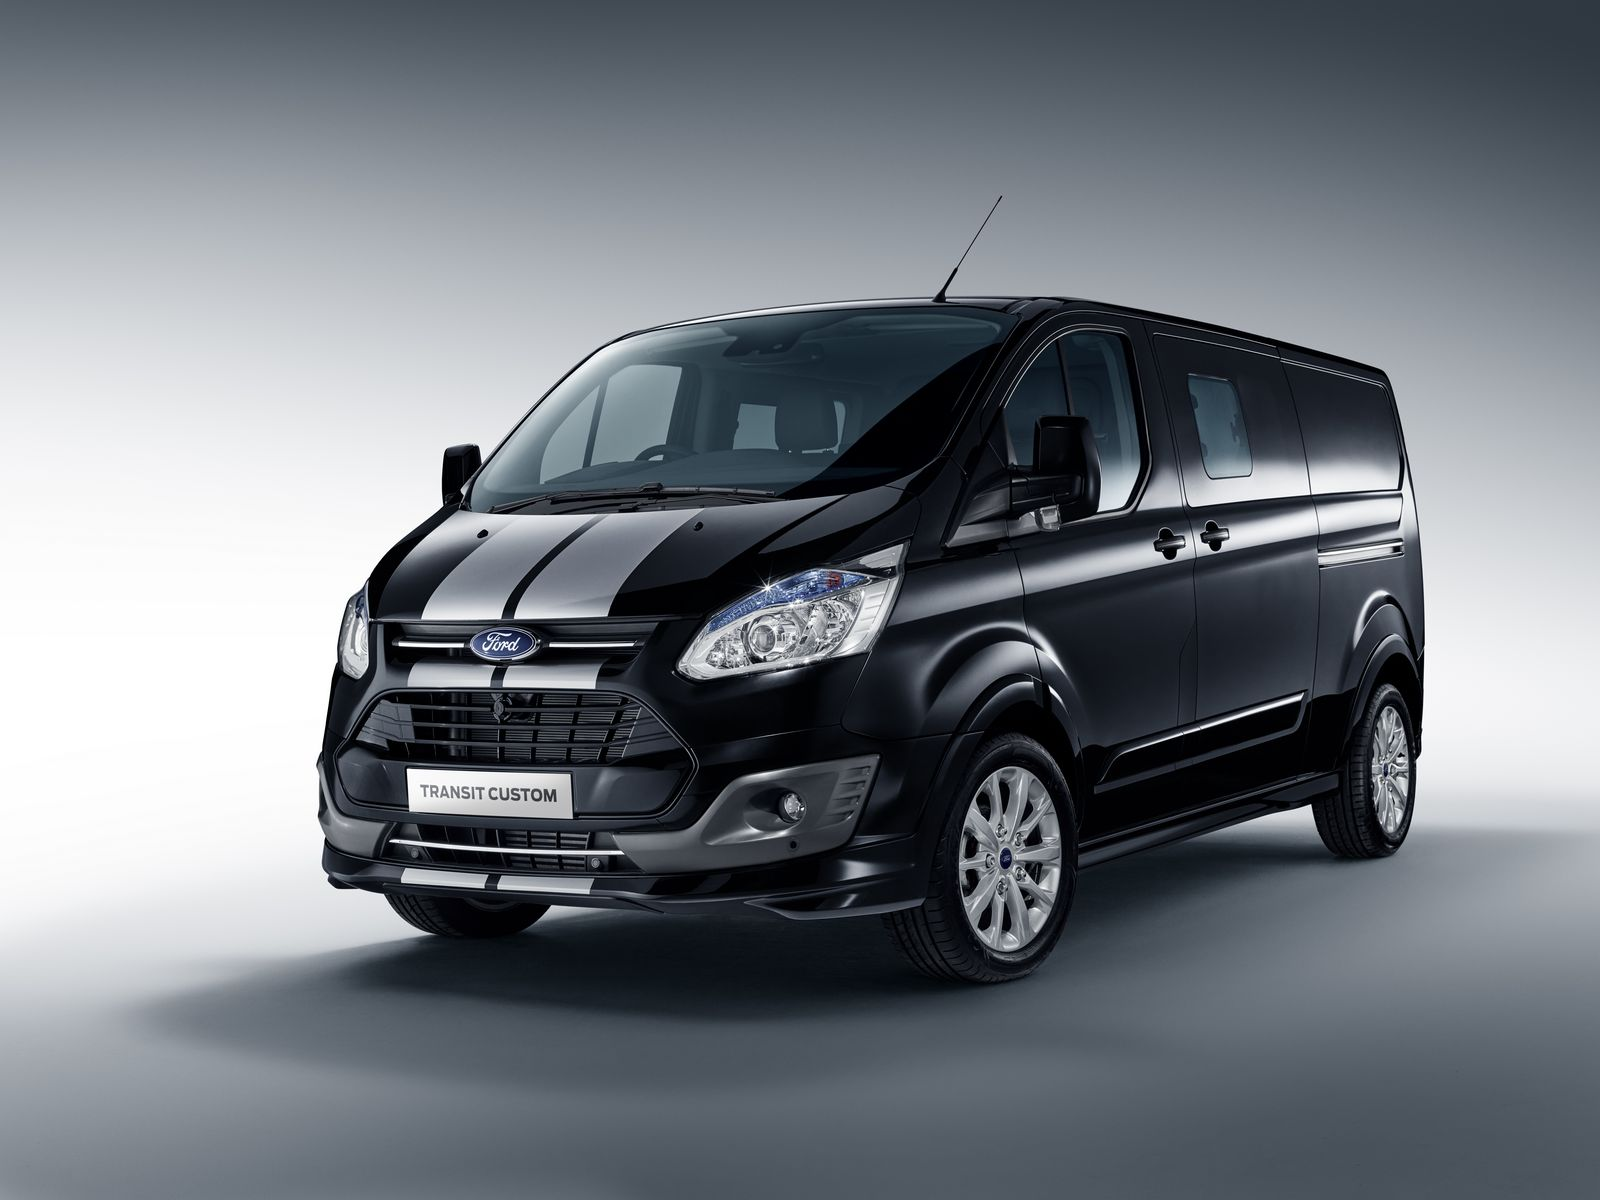 Ford tourneo custom ve transit custom modellerine 2 0lt motor geliyor